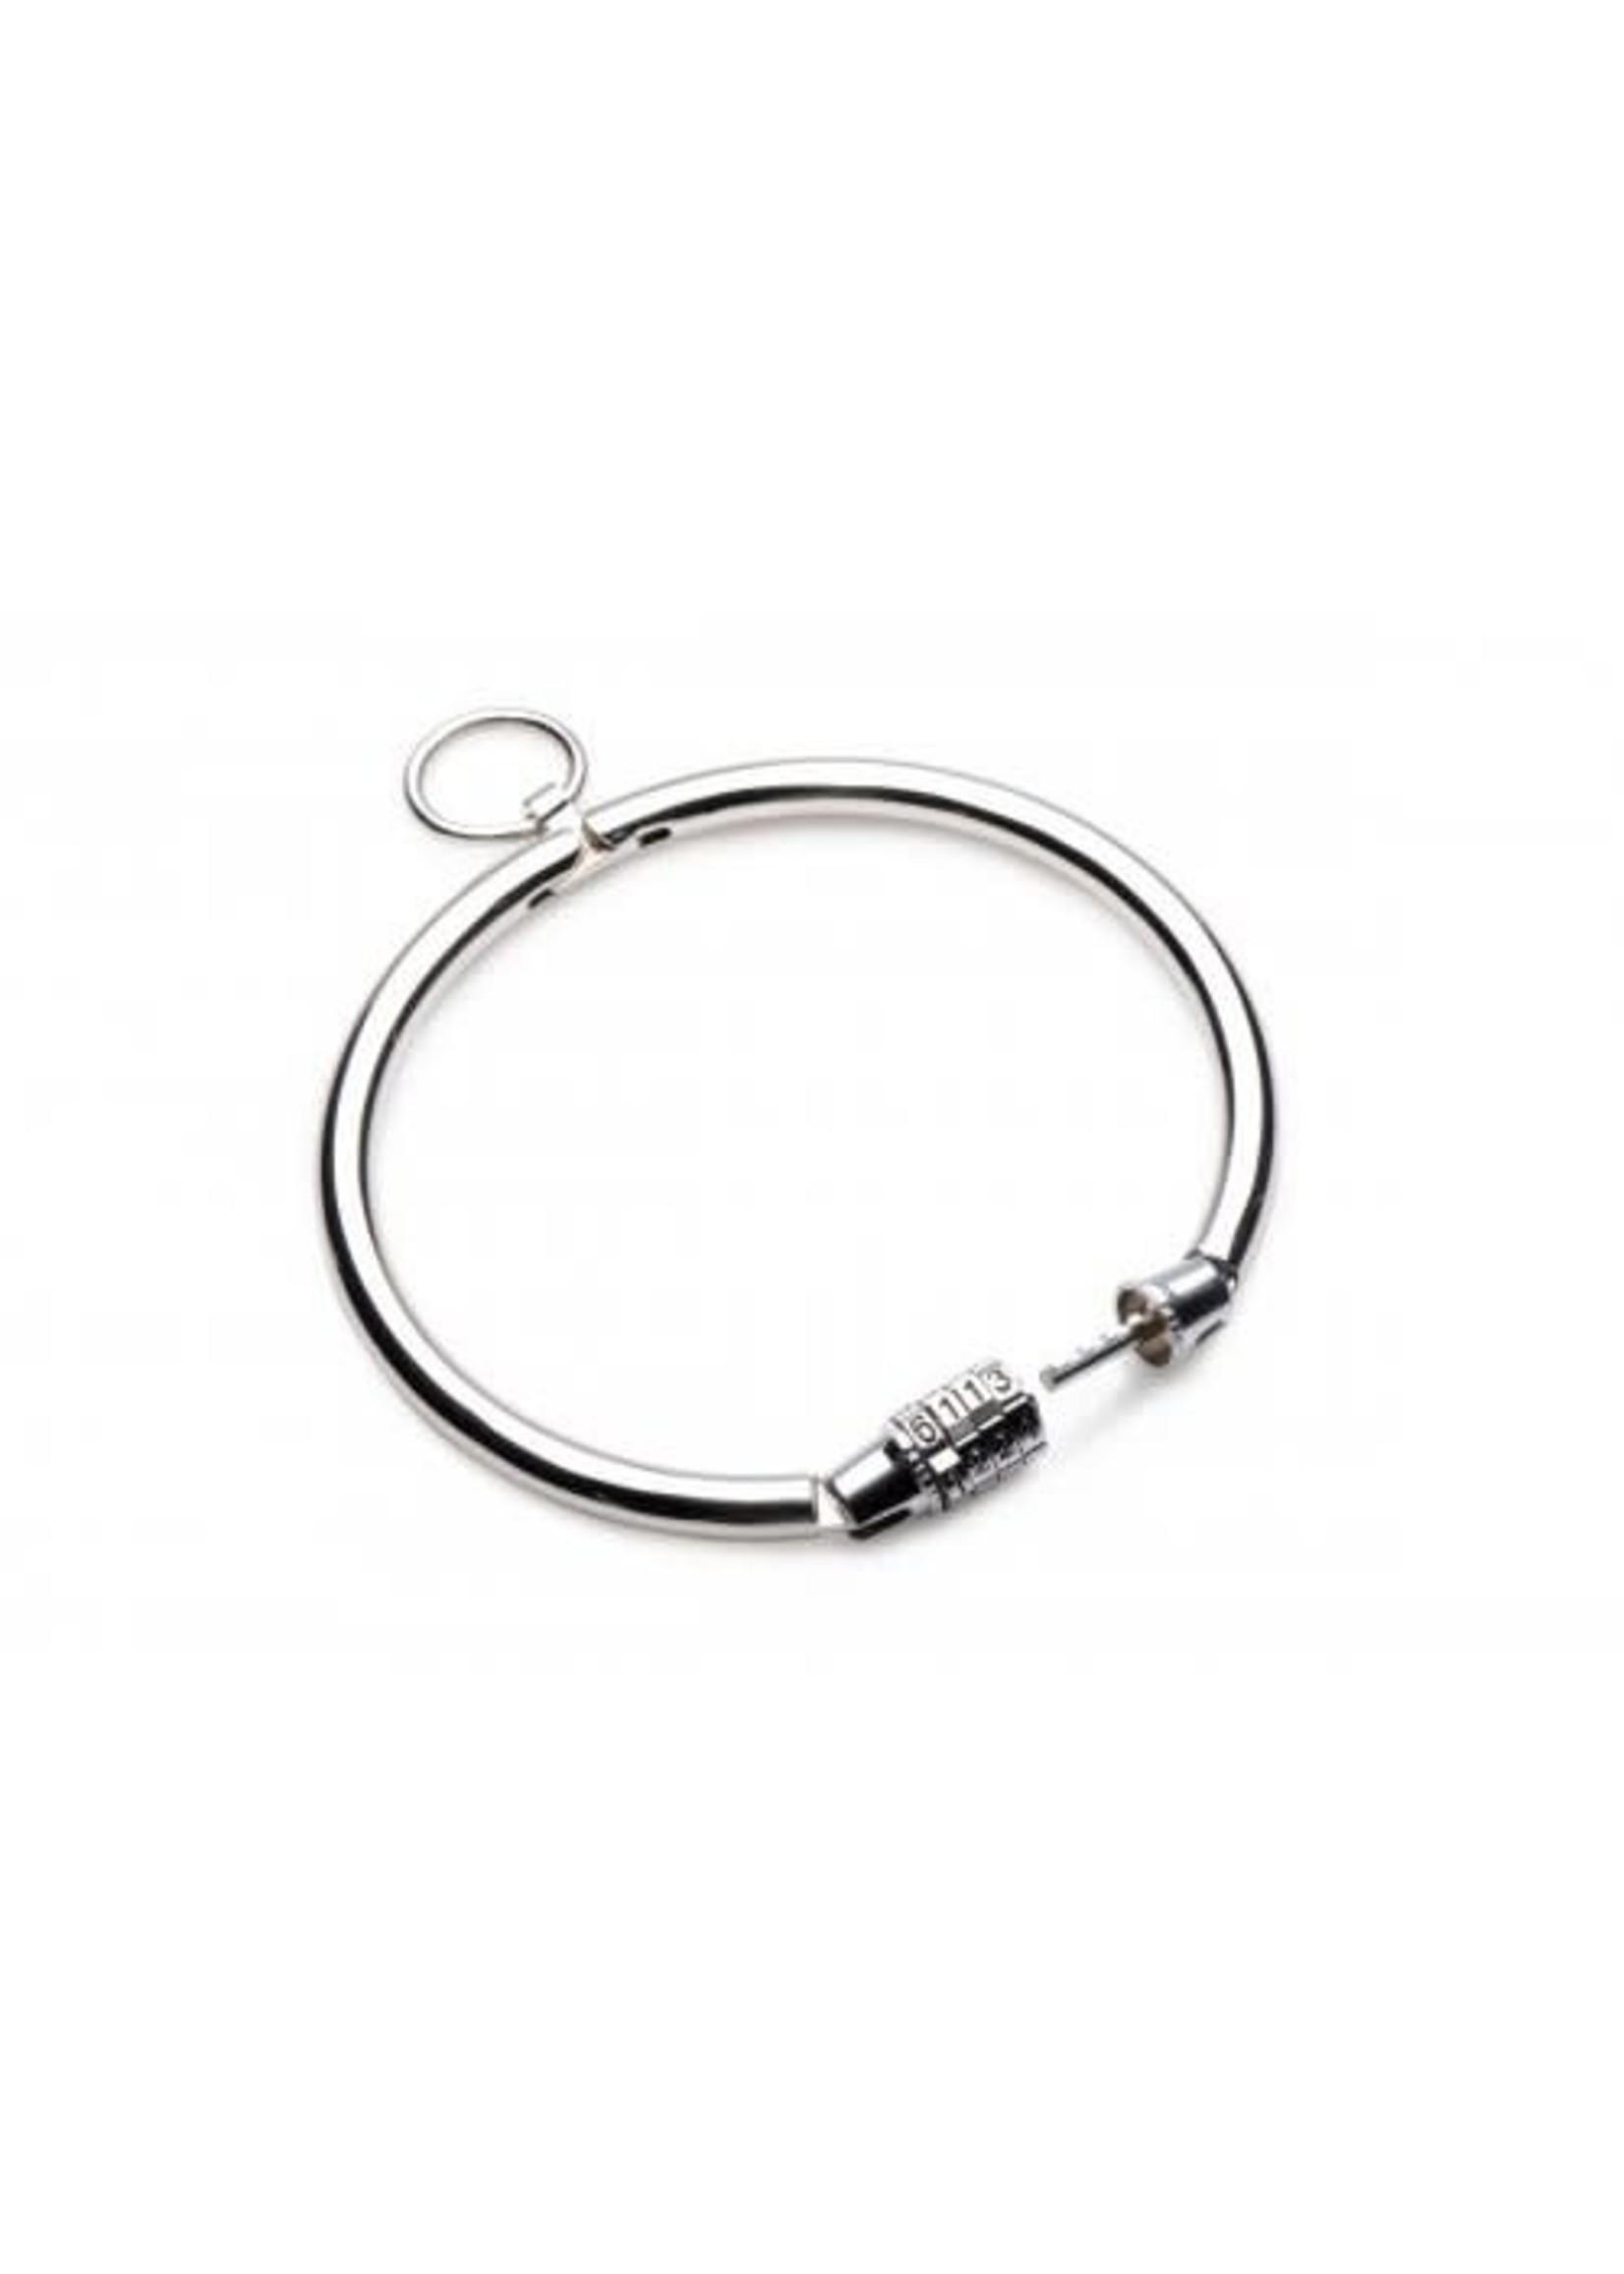 Master Series Master Series Combination Lock Collar